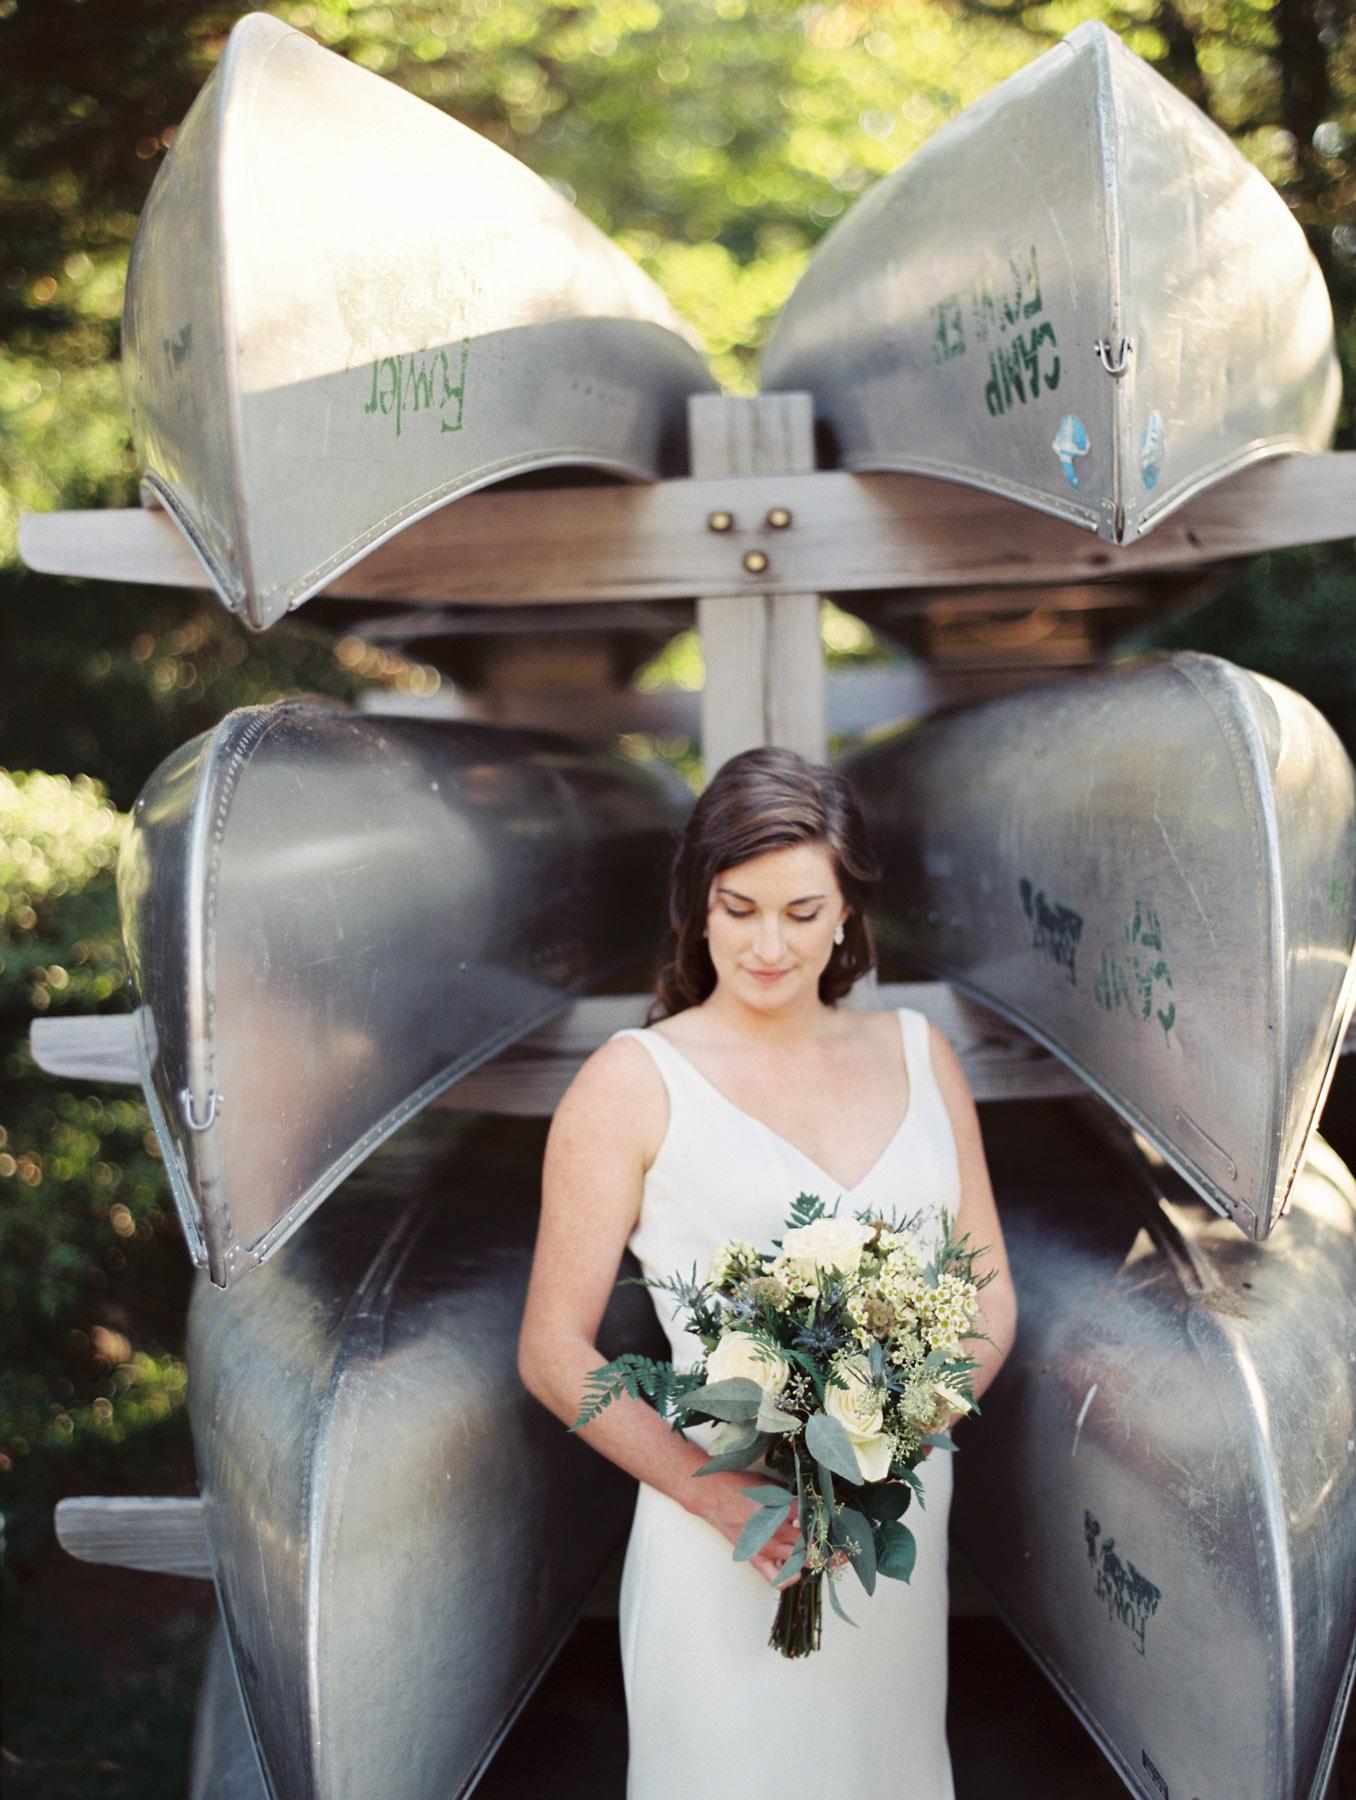 Wedding-Photography-Campground-16.jpg